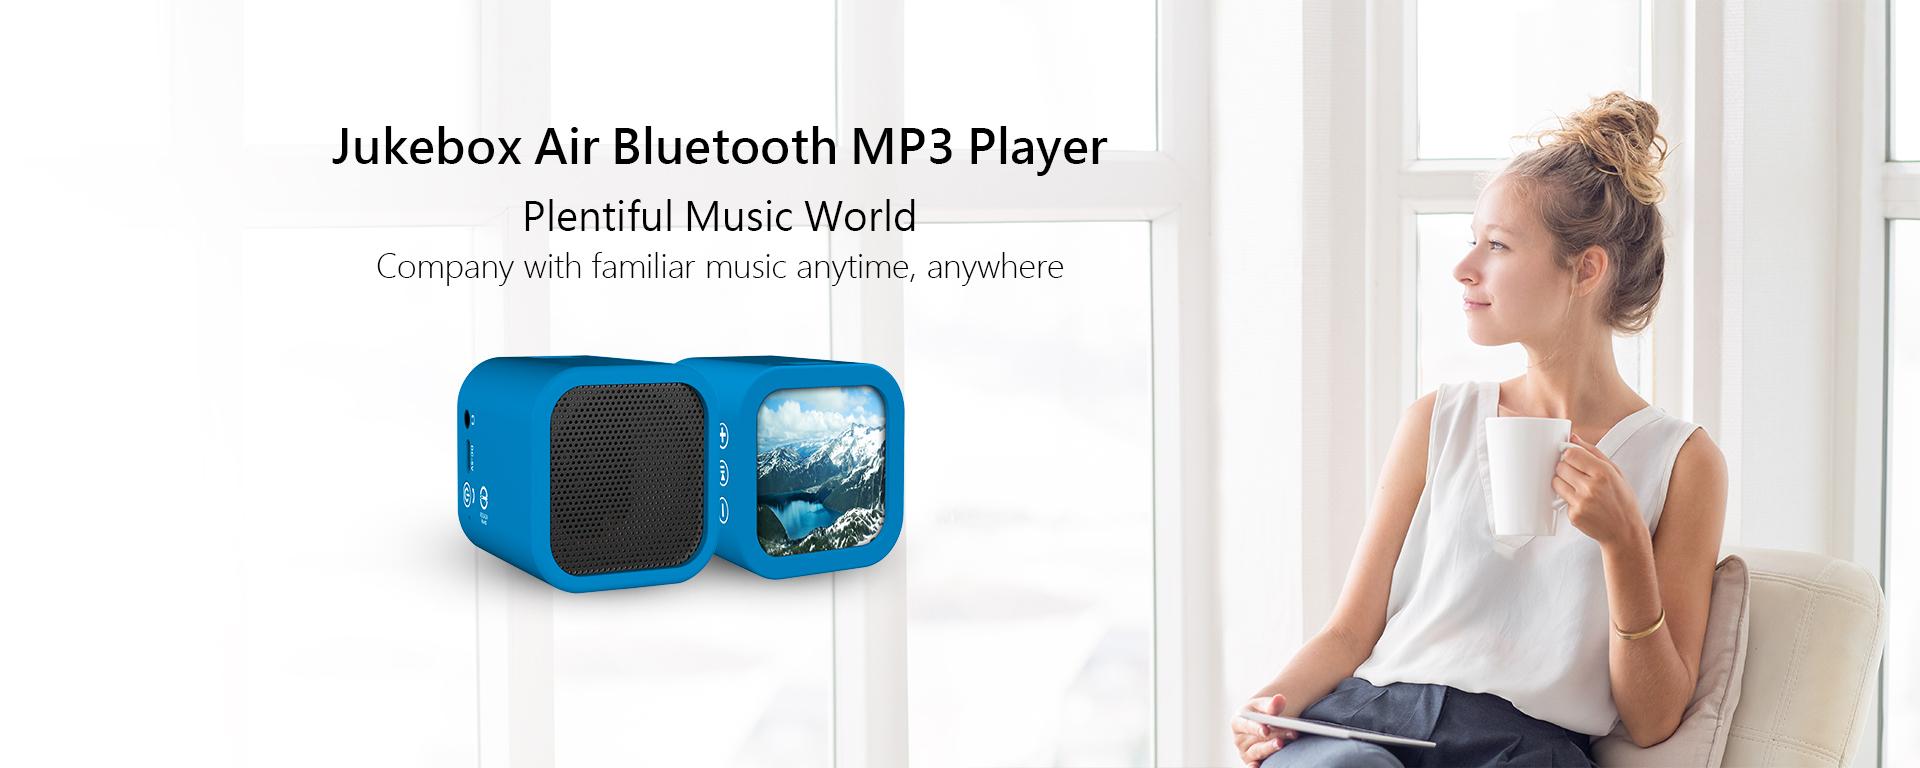 Jukebox Air Bluetooth MP3 Player